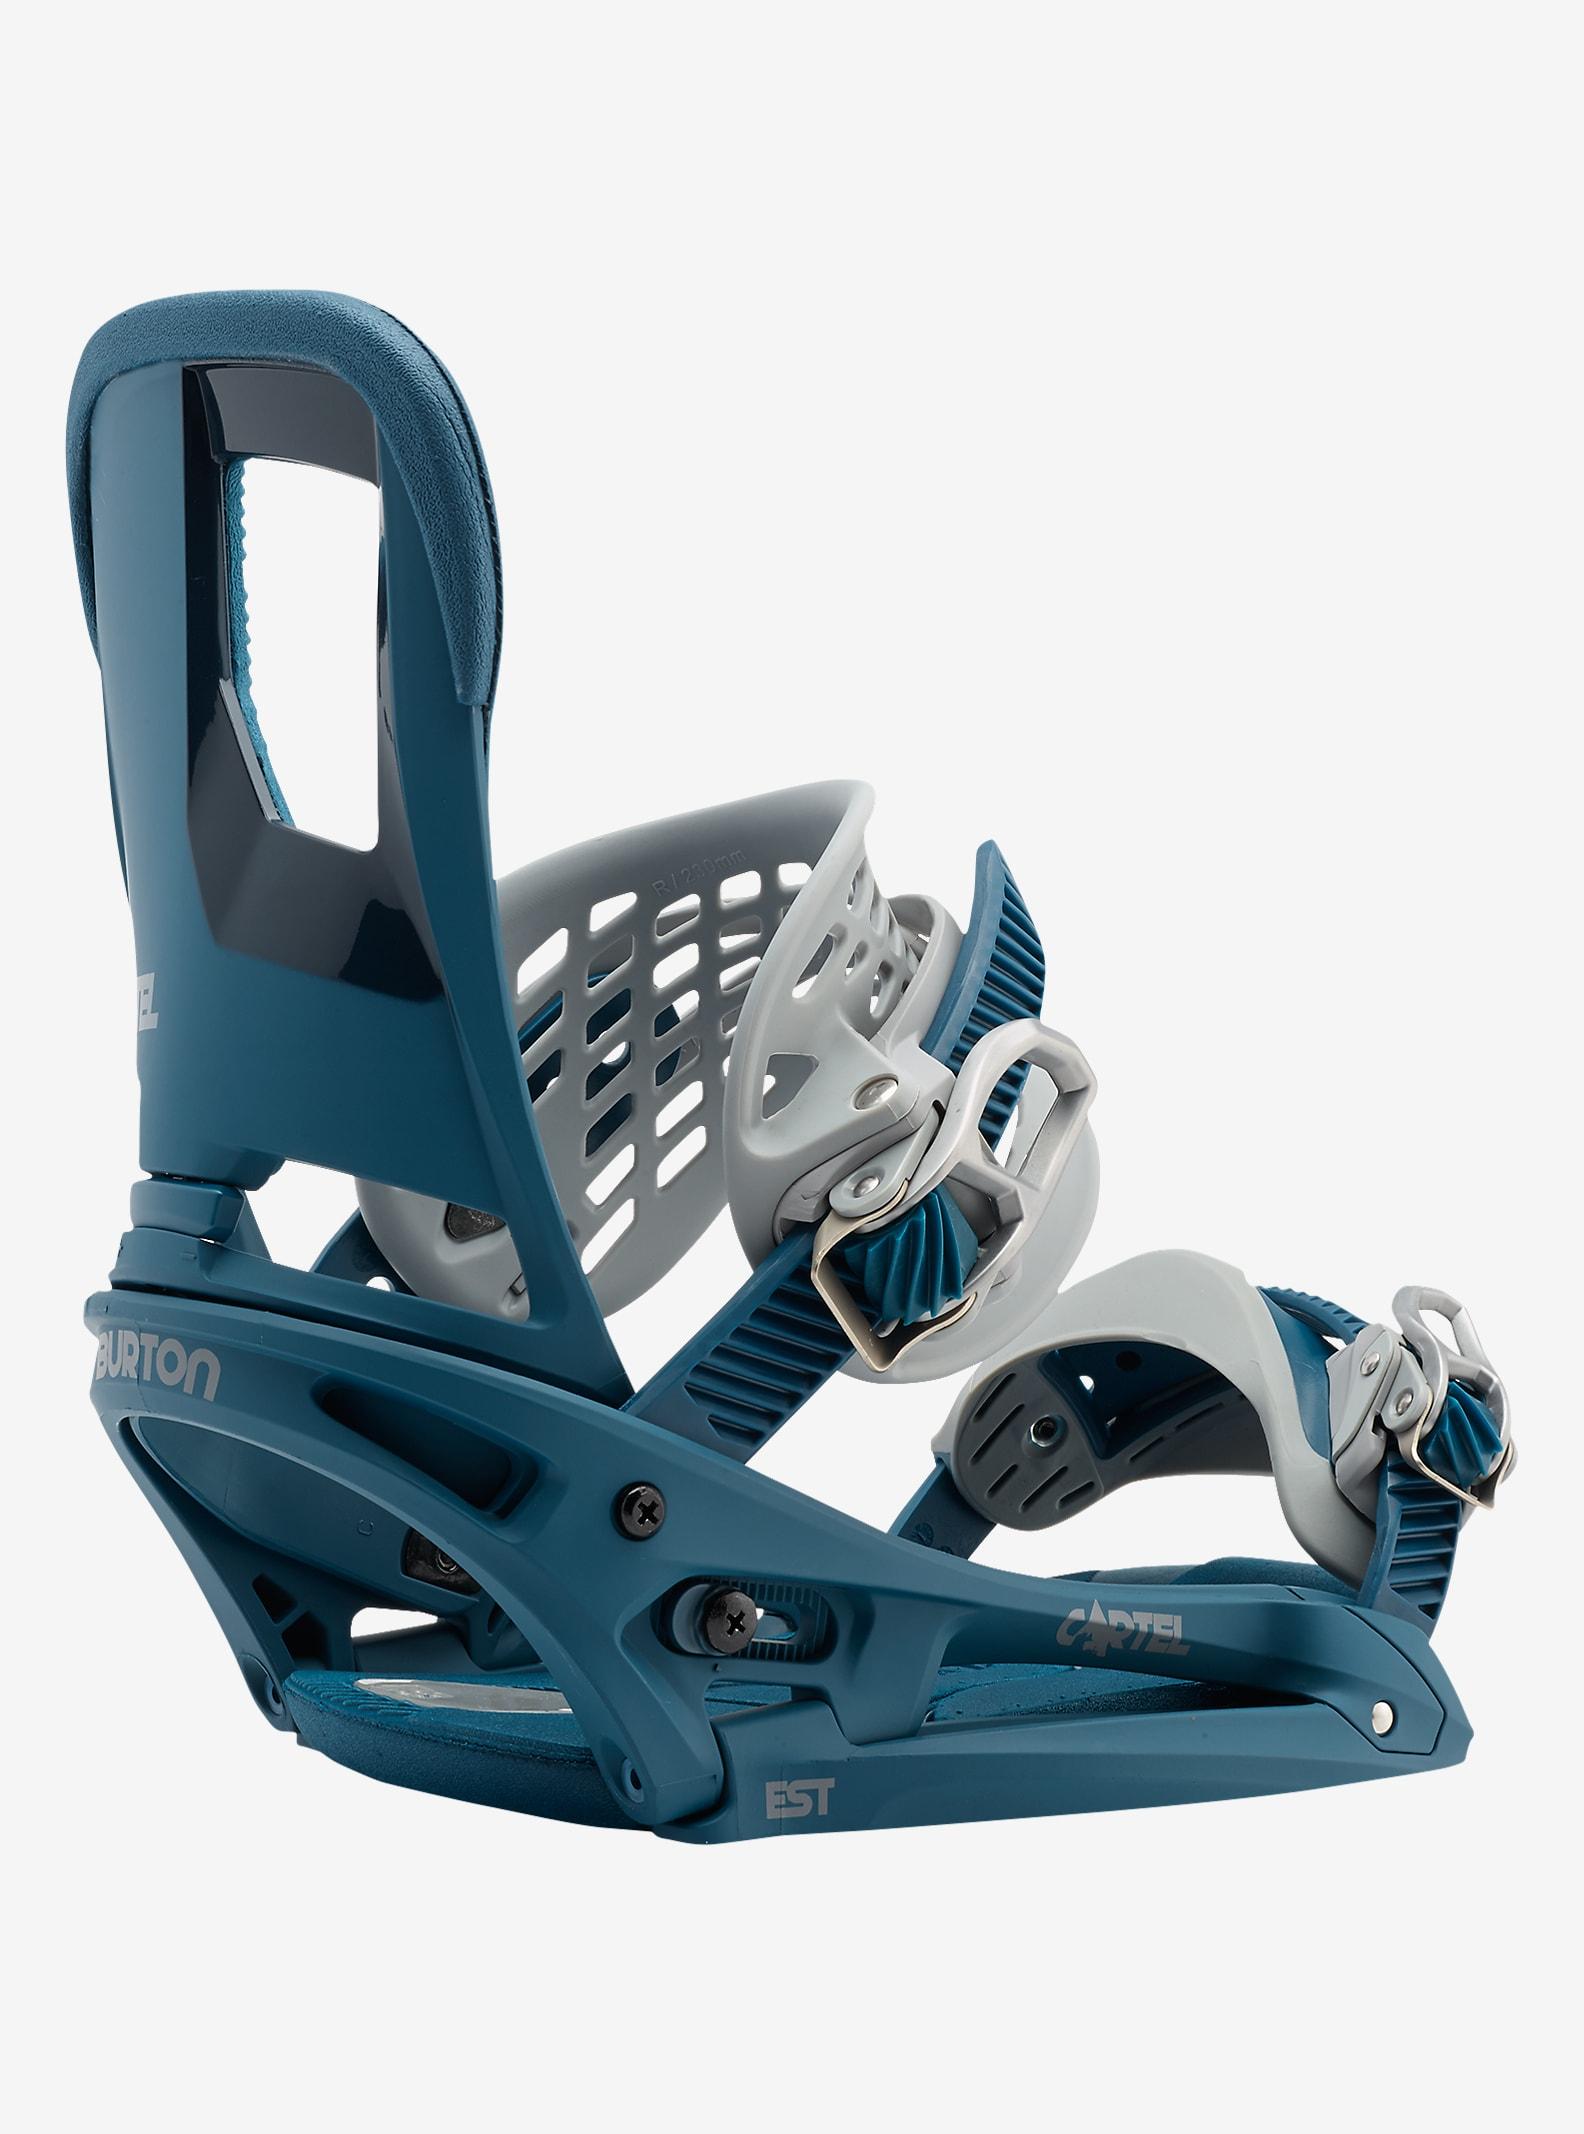 Burton Cartel EST Snowboardbindung angezeigt in Steel Blue